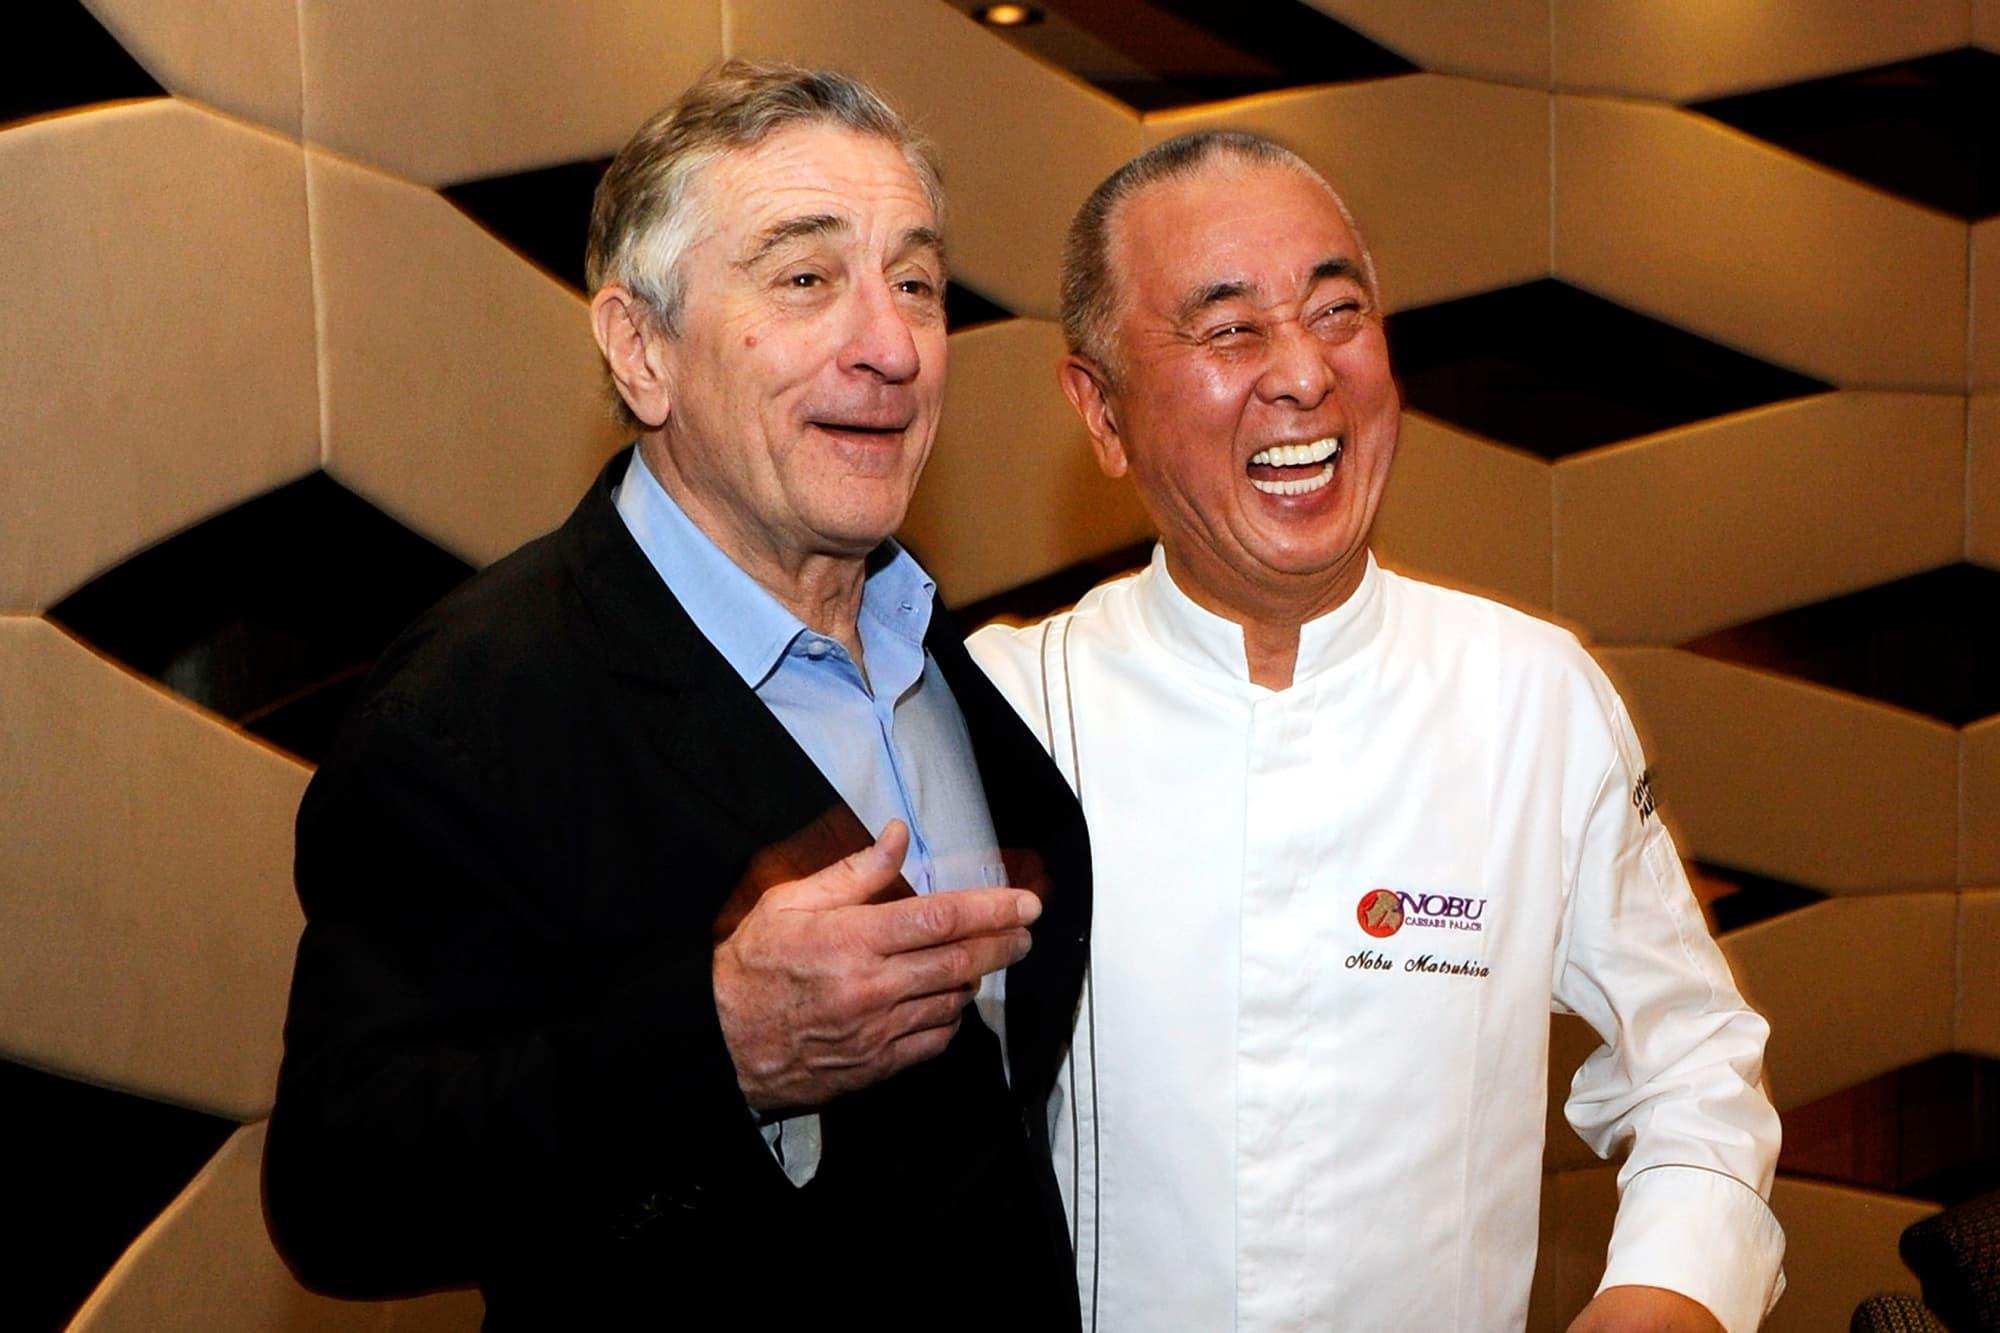 Japanese chef Nobu originally refused Robert De Niro's New York restaurant offer